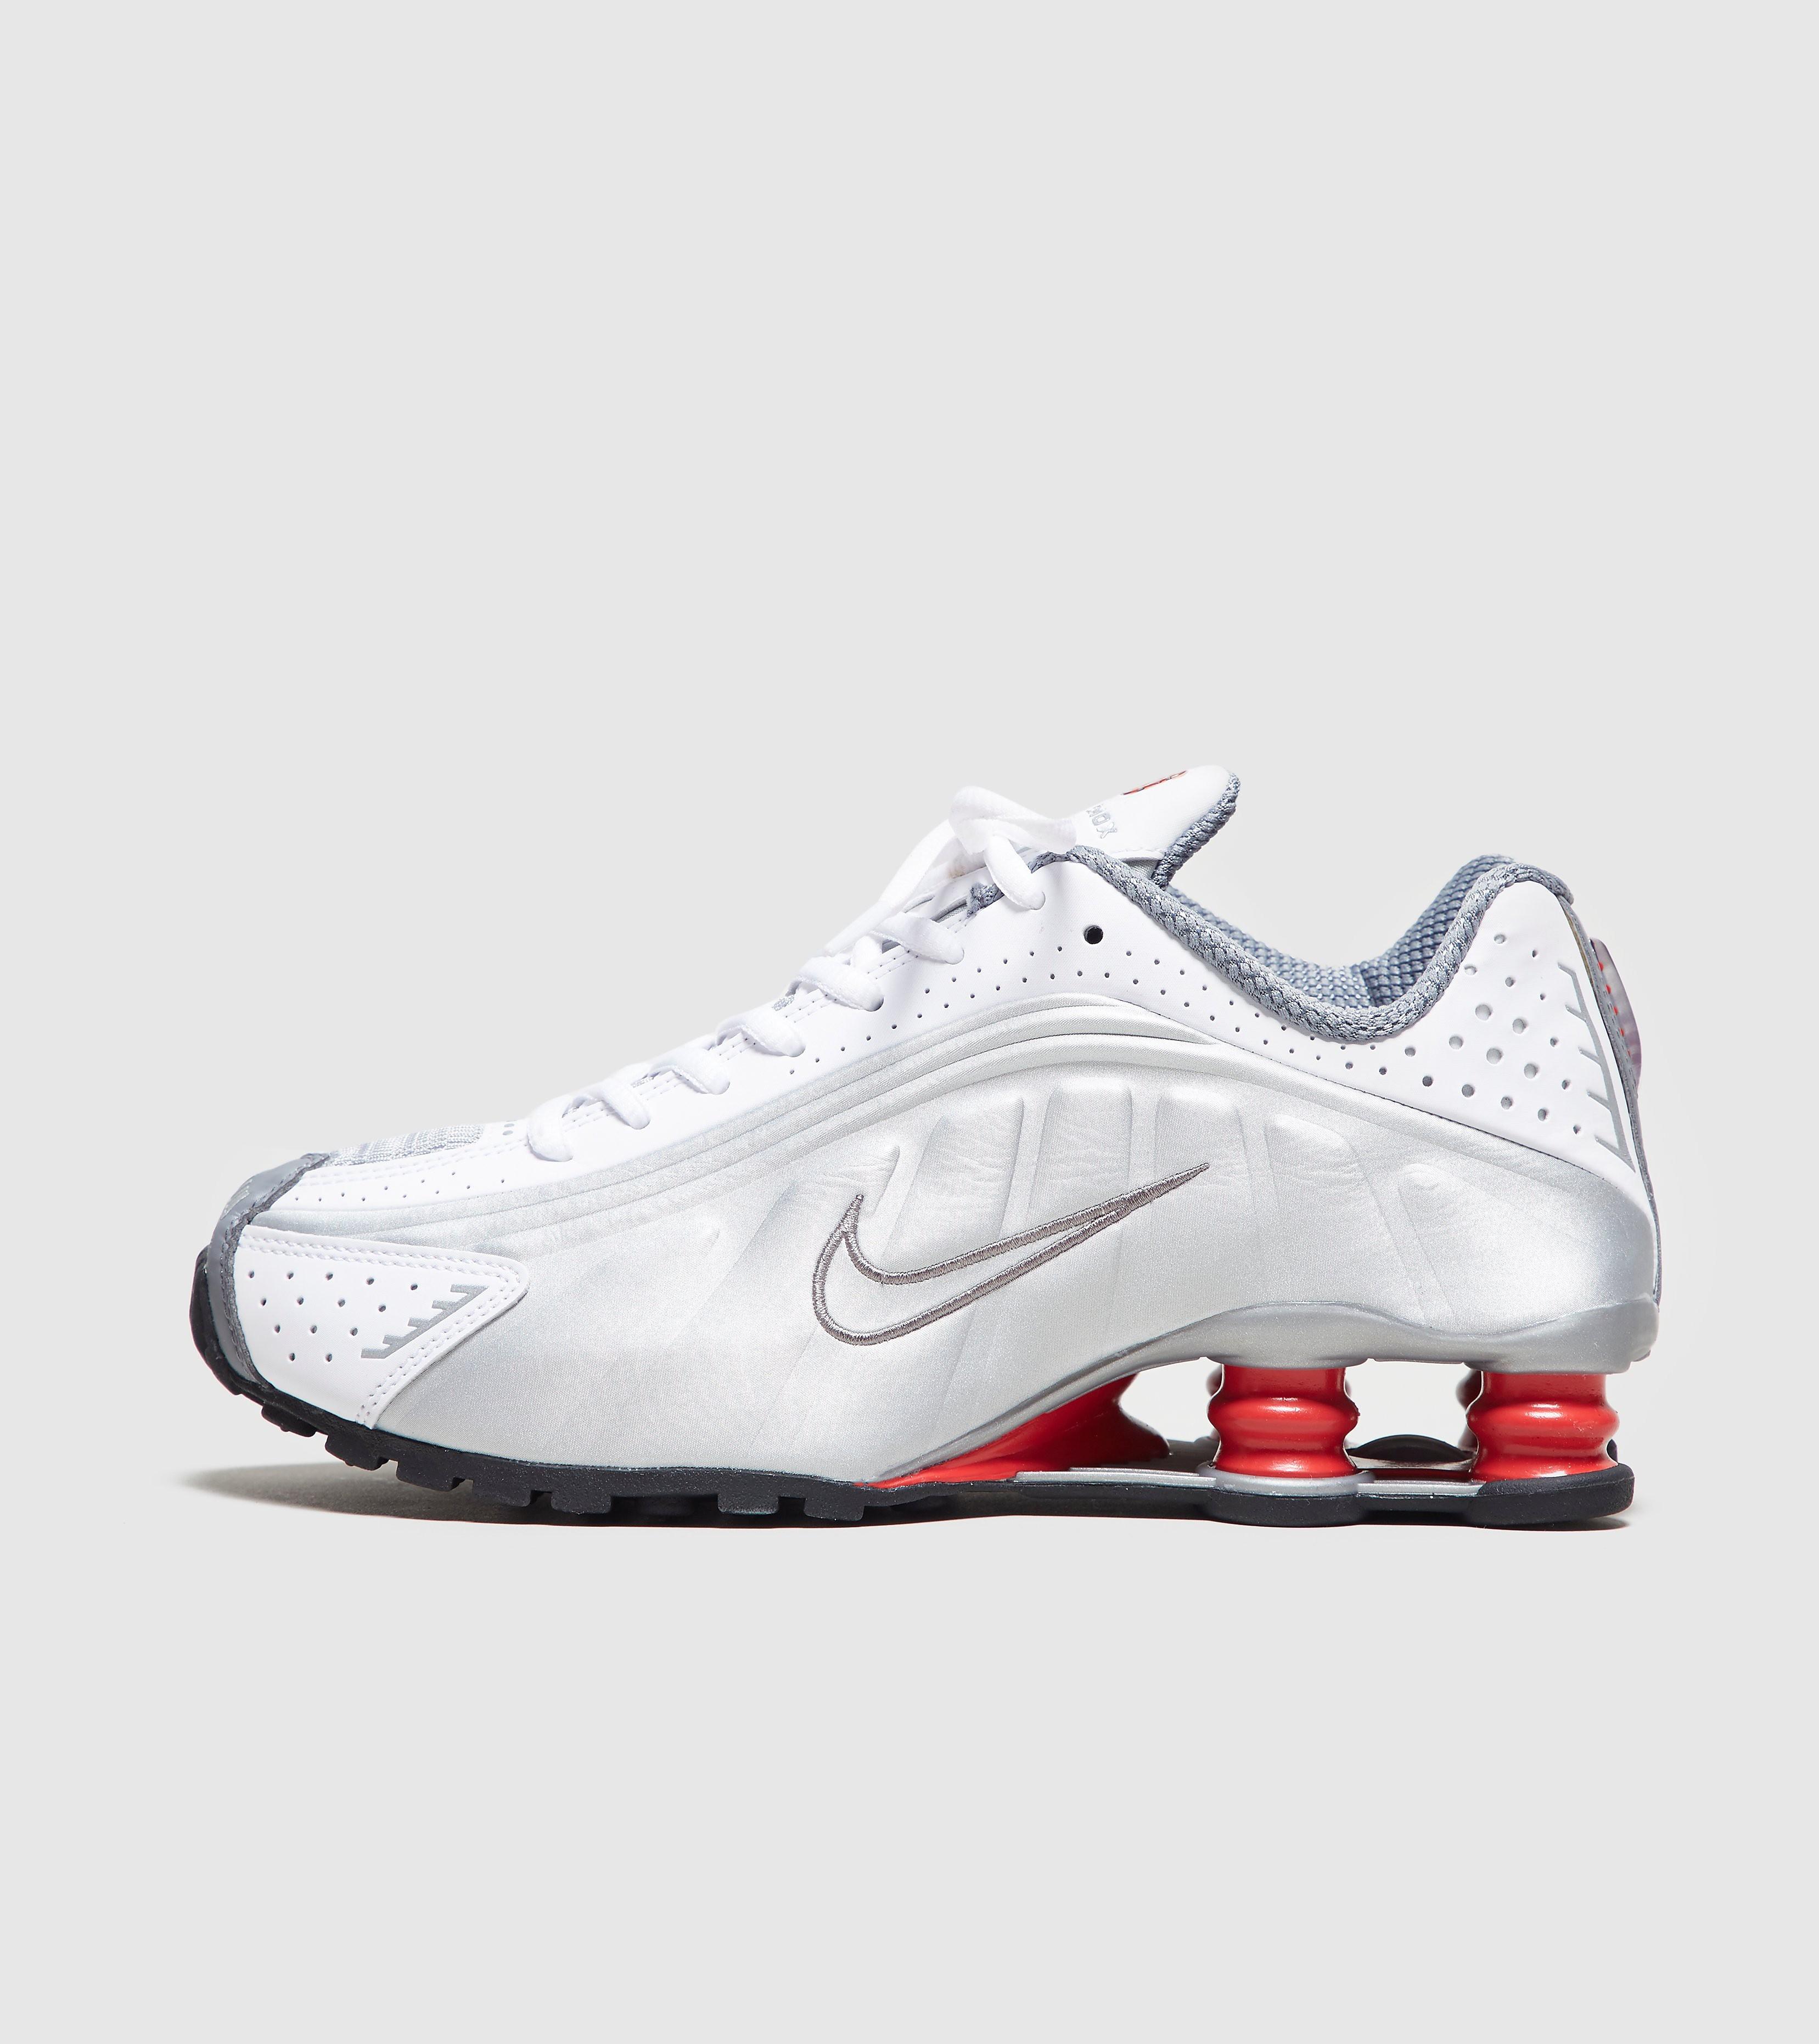 quality design 37265 e2d5b Nike - London Trend